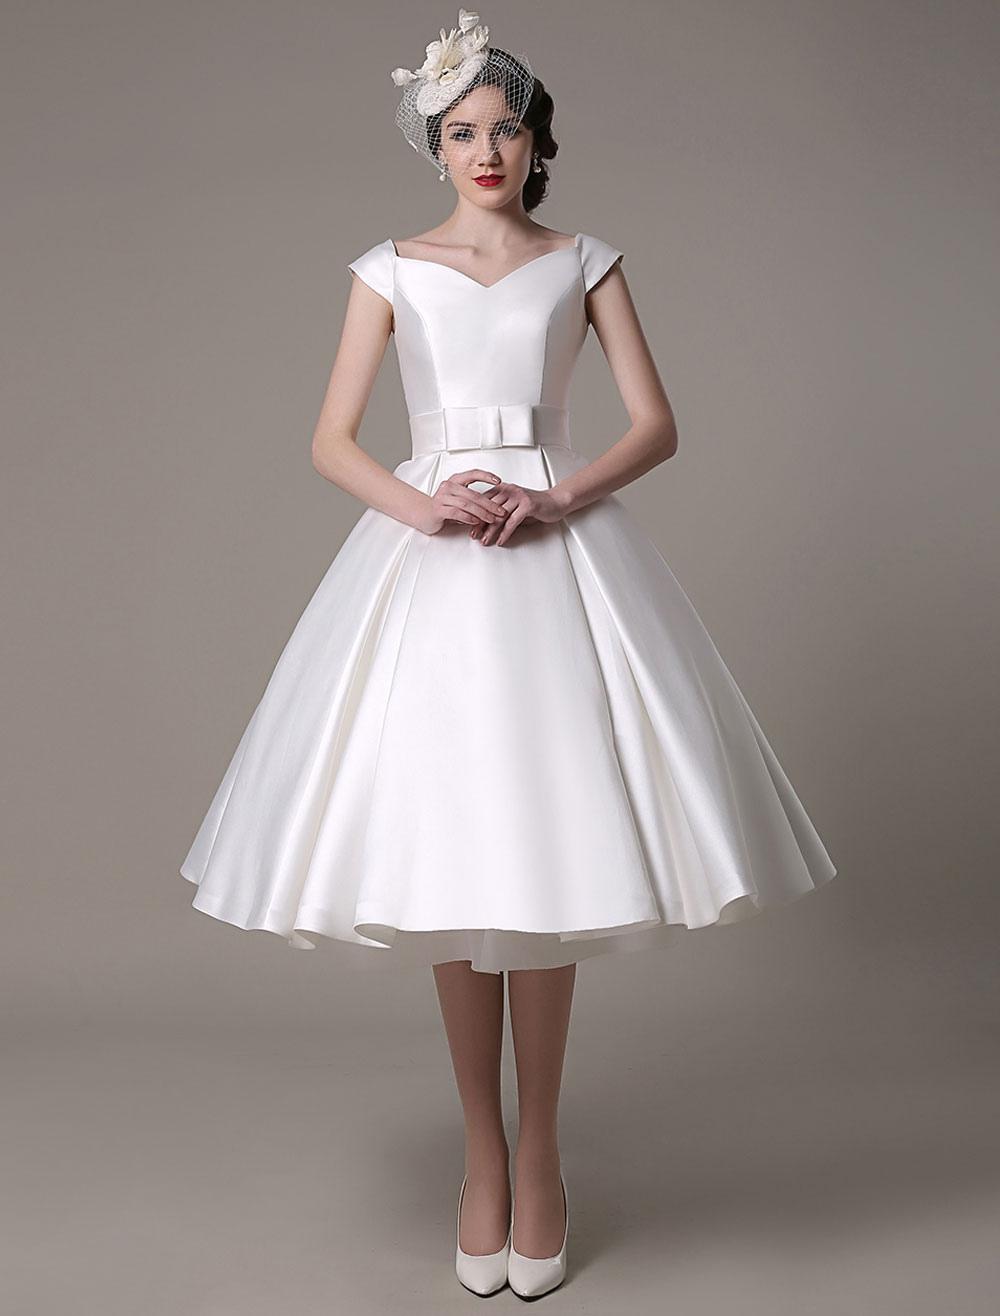 Ivory Wedding Dresses 2019 short satin Knee Length bow